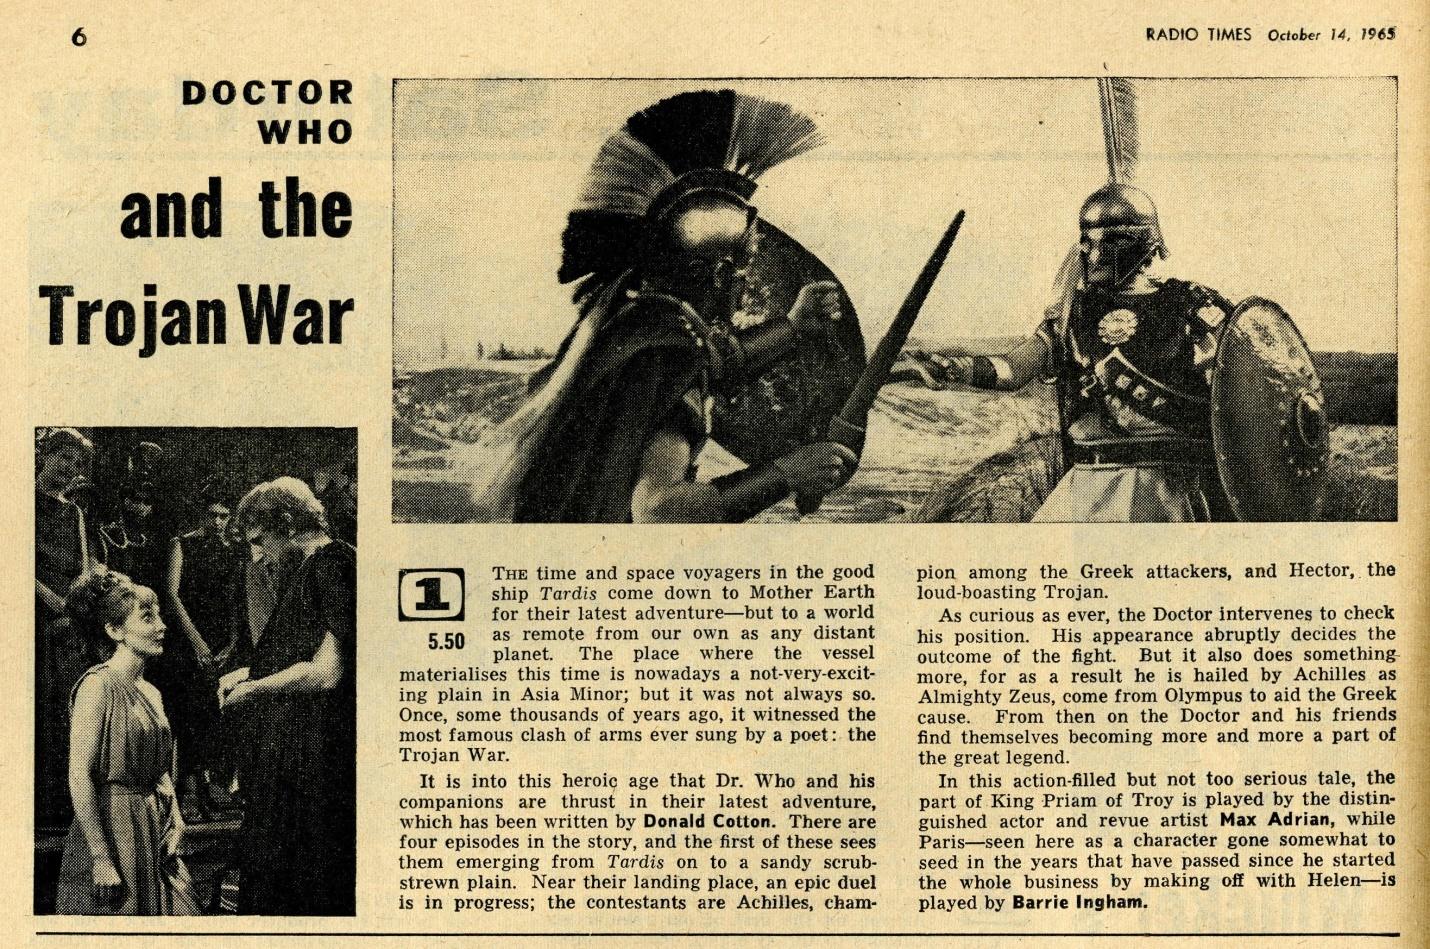 Radio Times, October 16-22, 1965